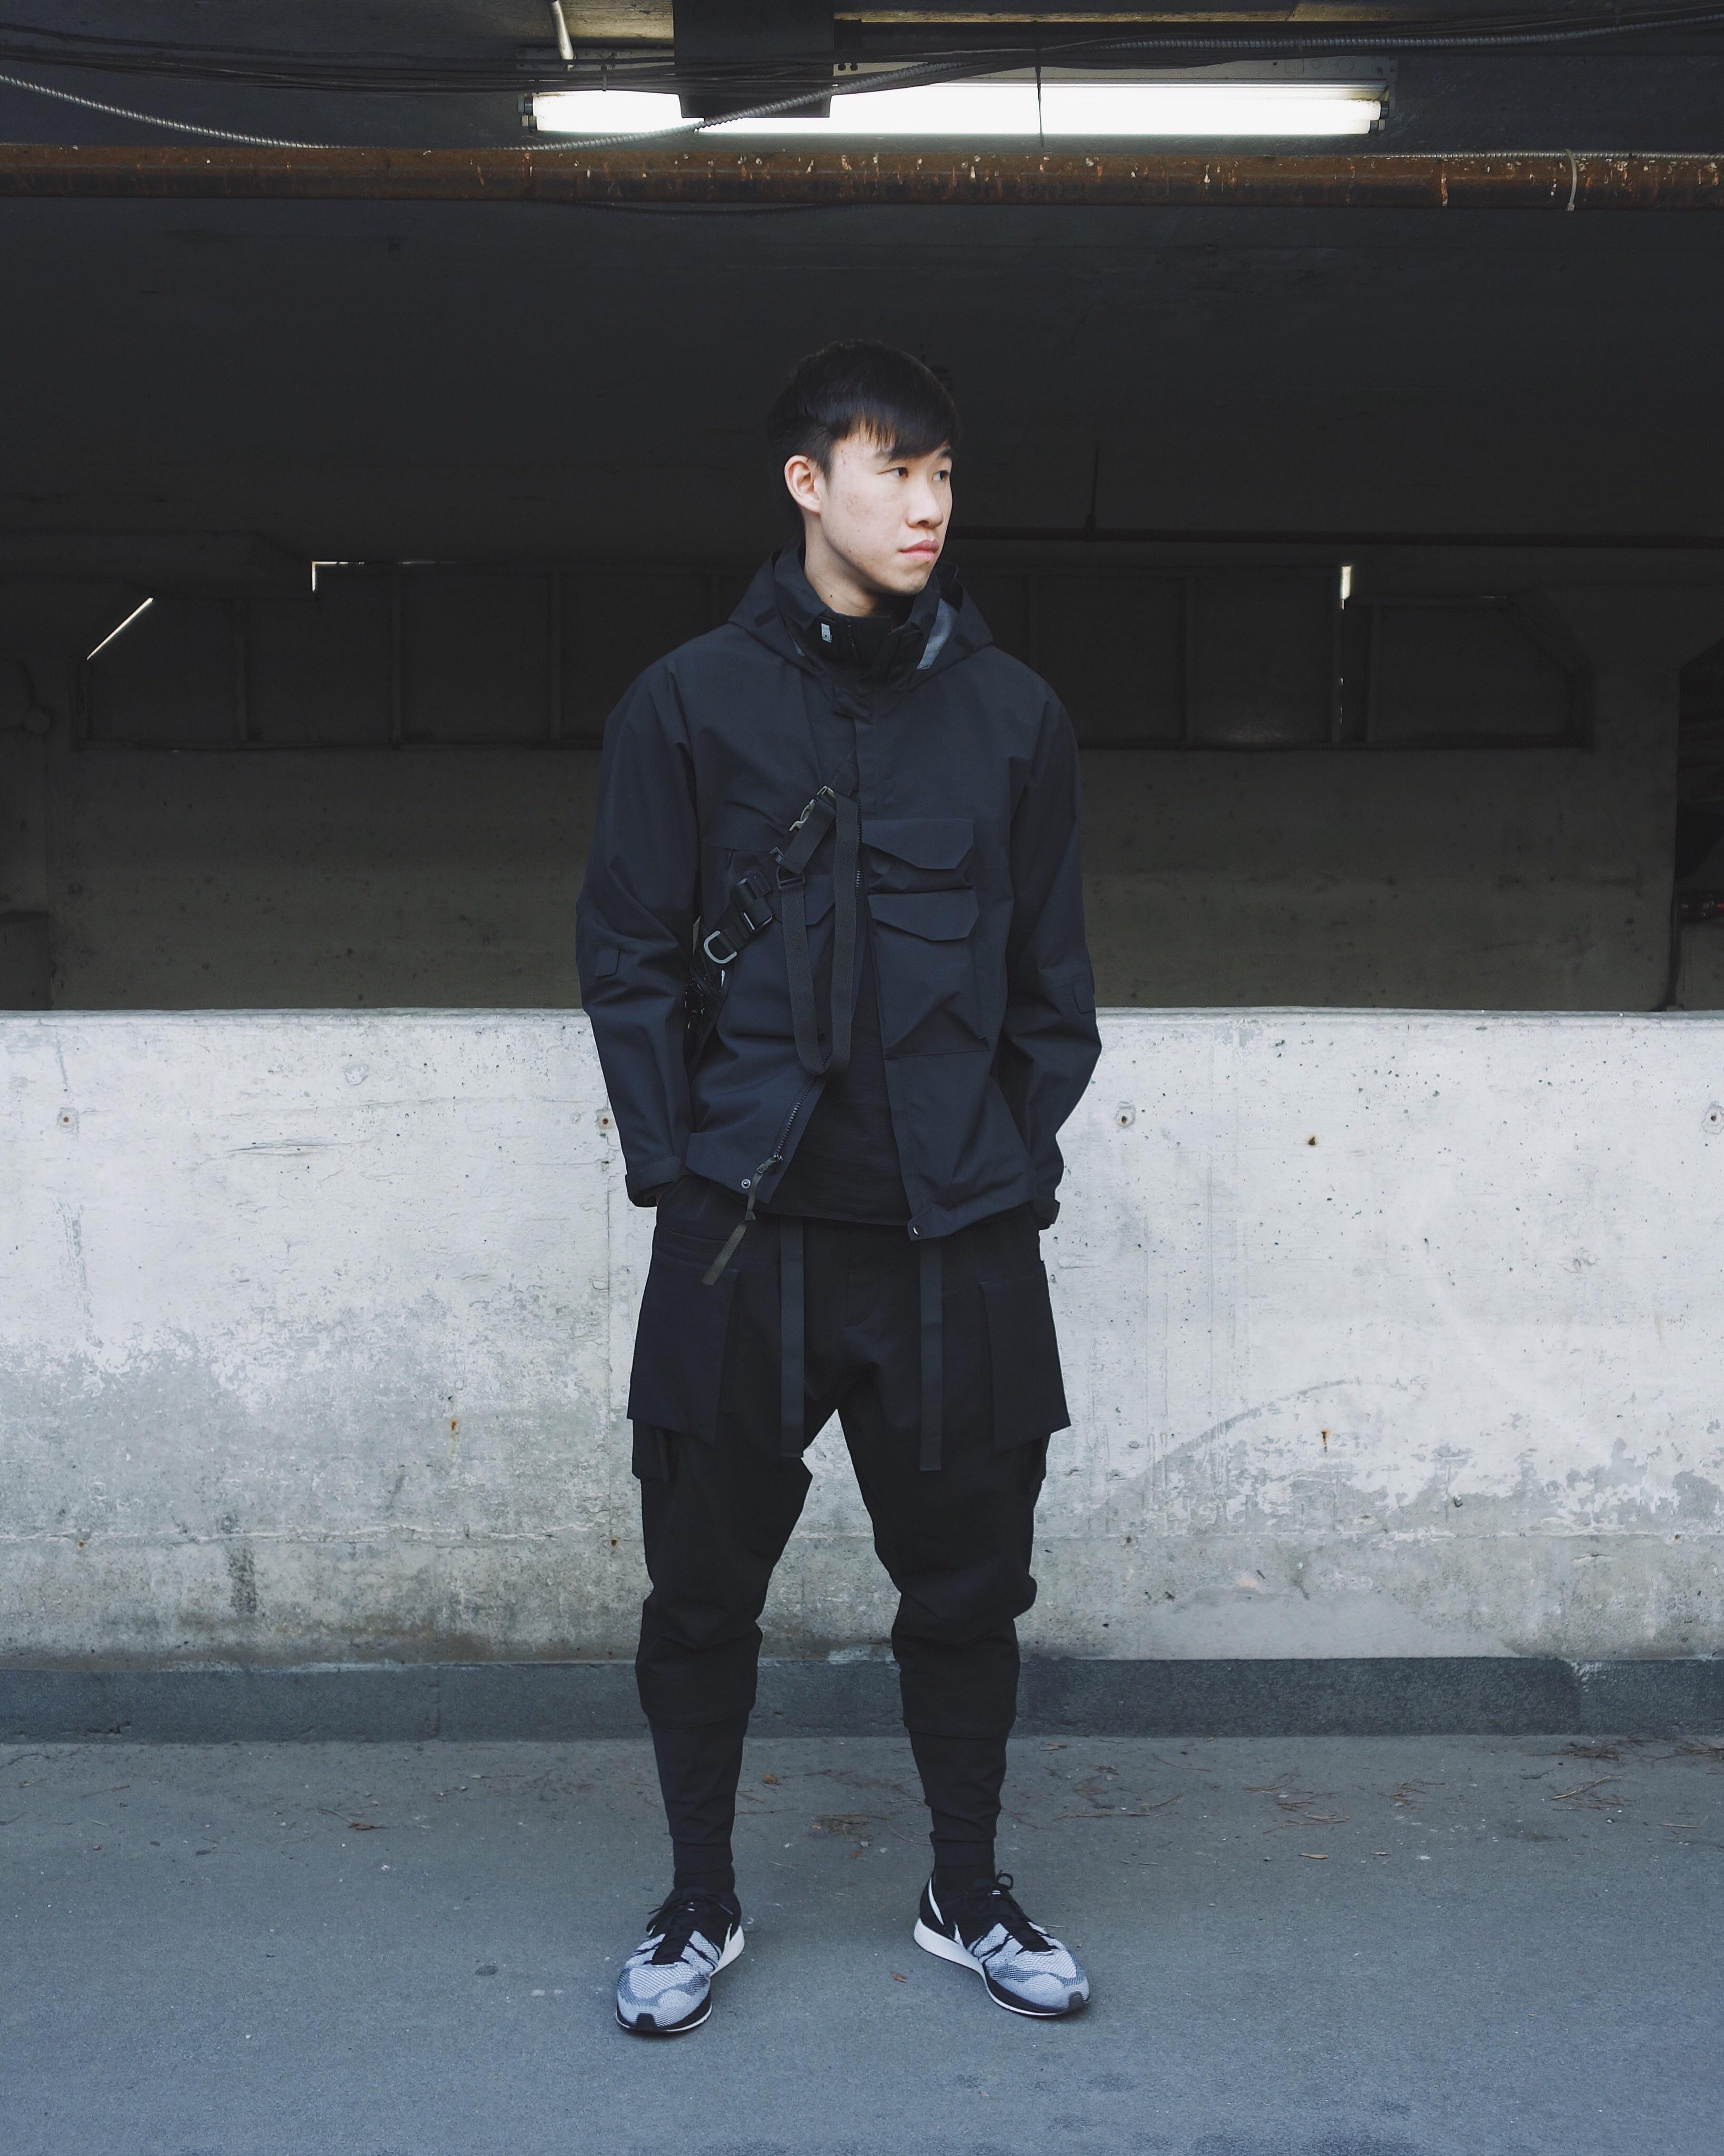 Techwear Urban Street Style, Bape, Street Wear, Cyberpunk, Futuristic,  Fashion Shoes cdb890ce46c